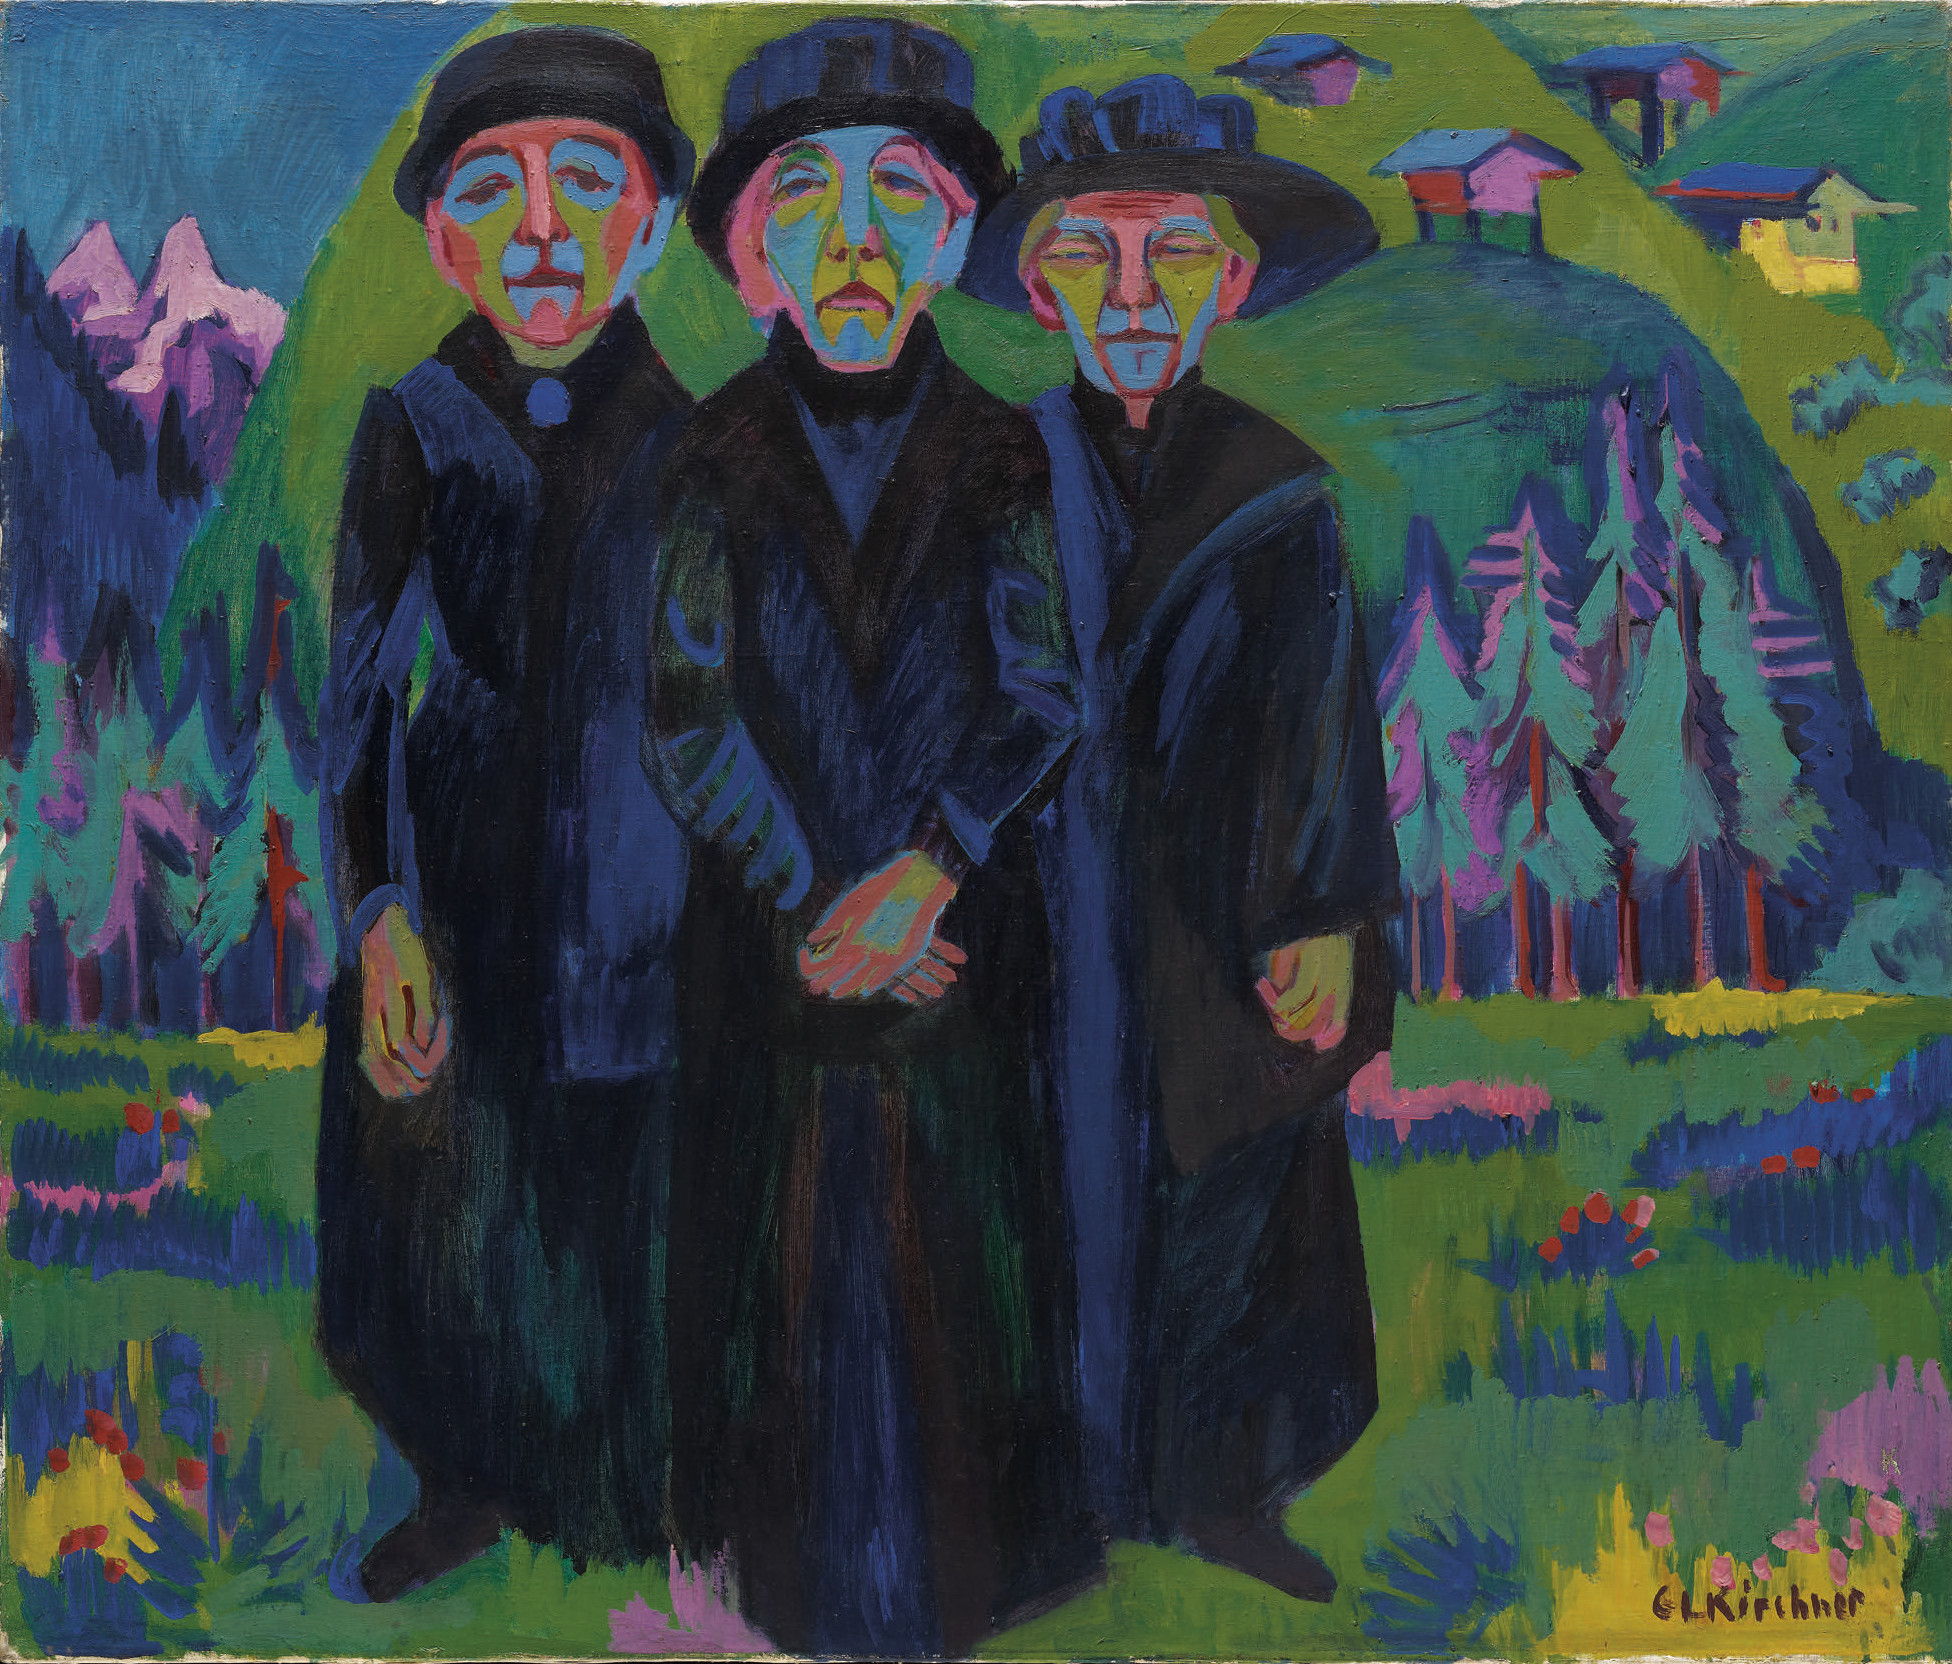 Espressionismo di Kirchner in una grande mostra a Cecina